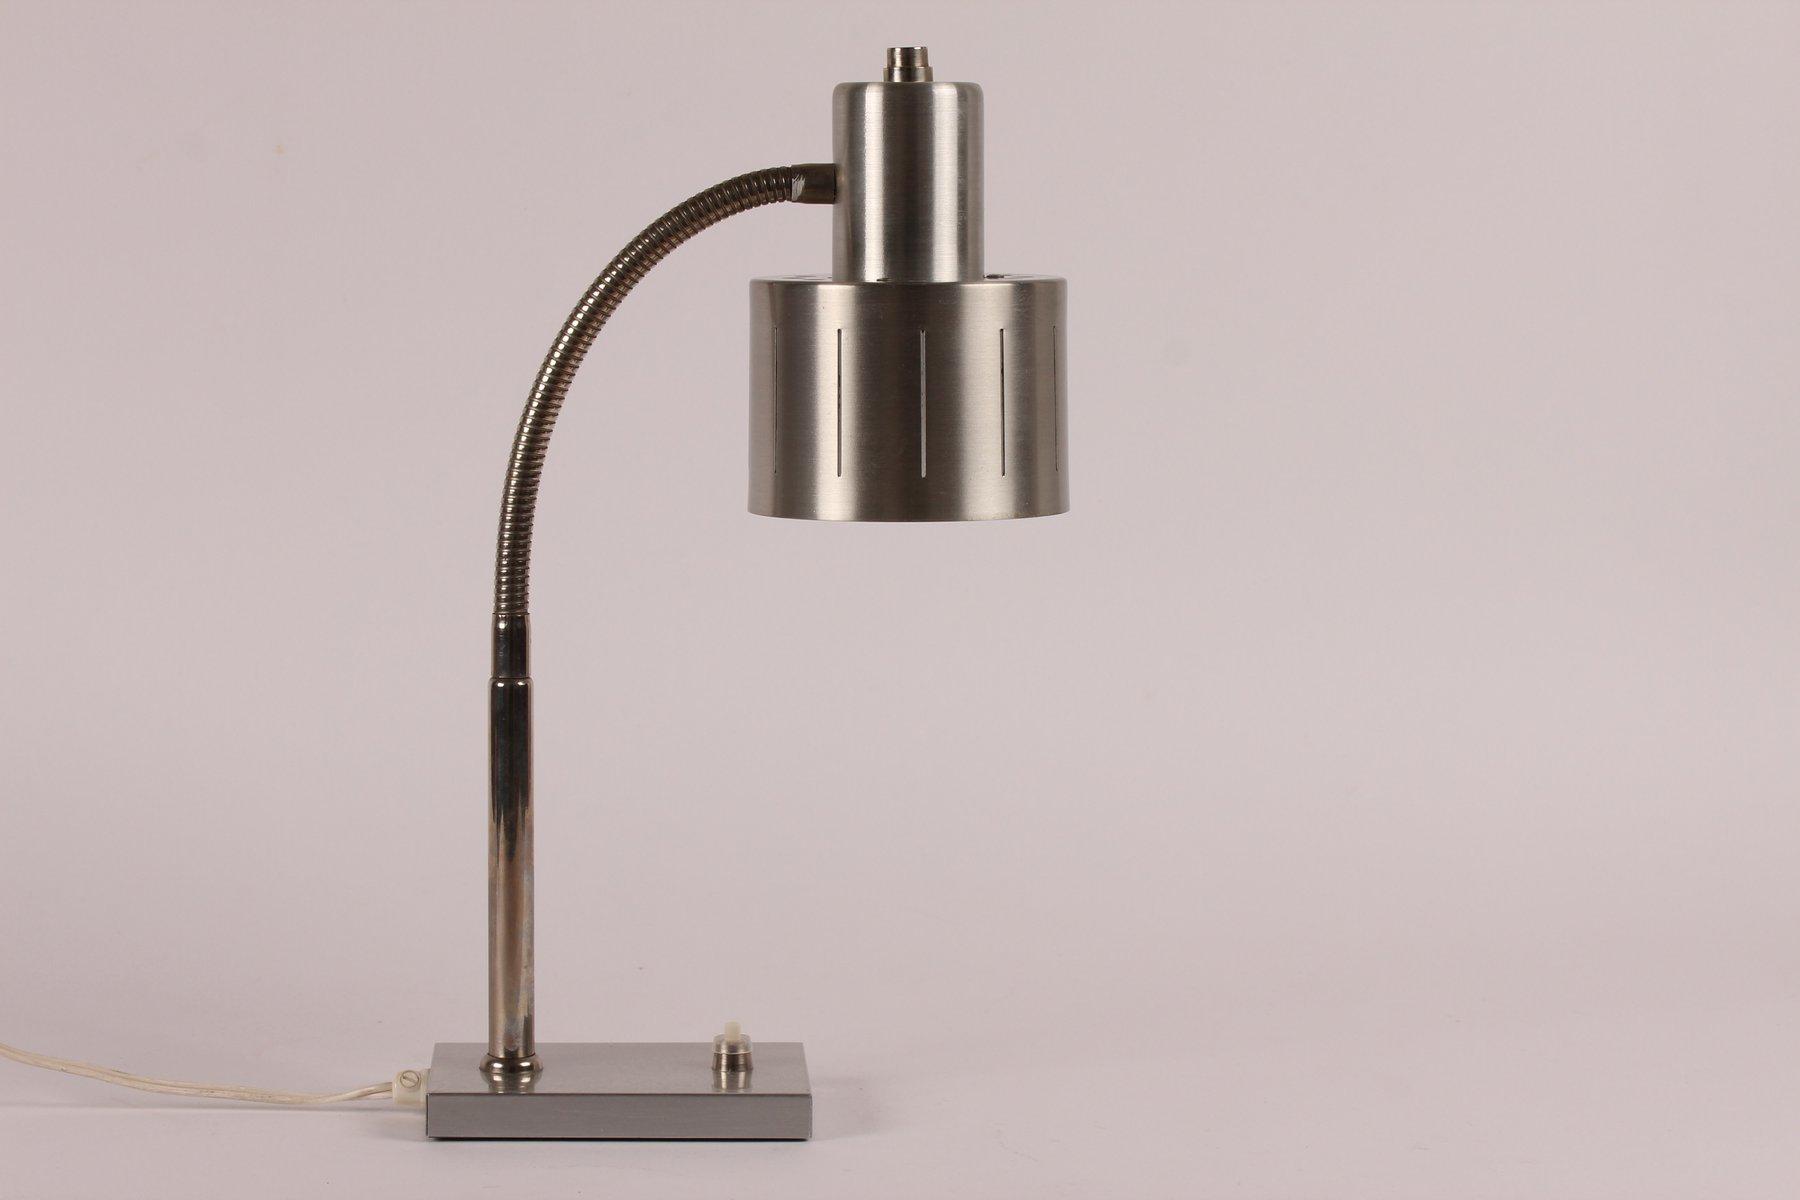 Skandinavische Modern Tischlampe, 1970er